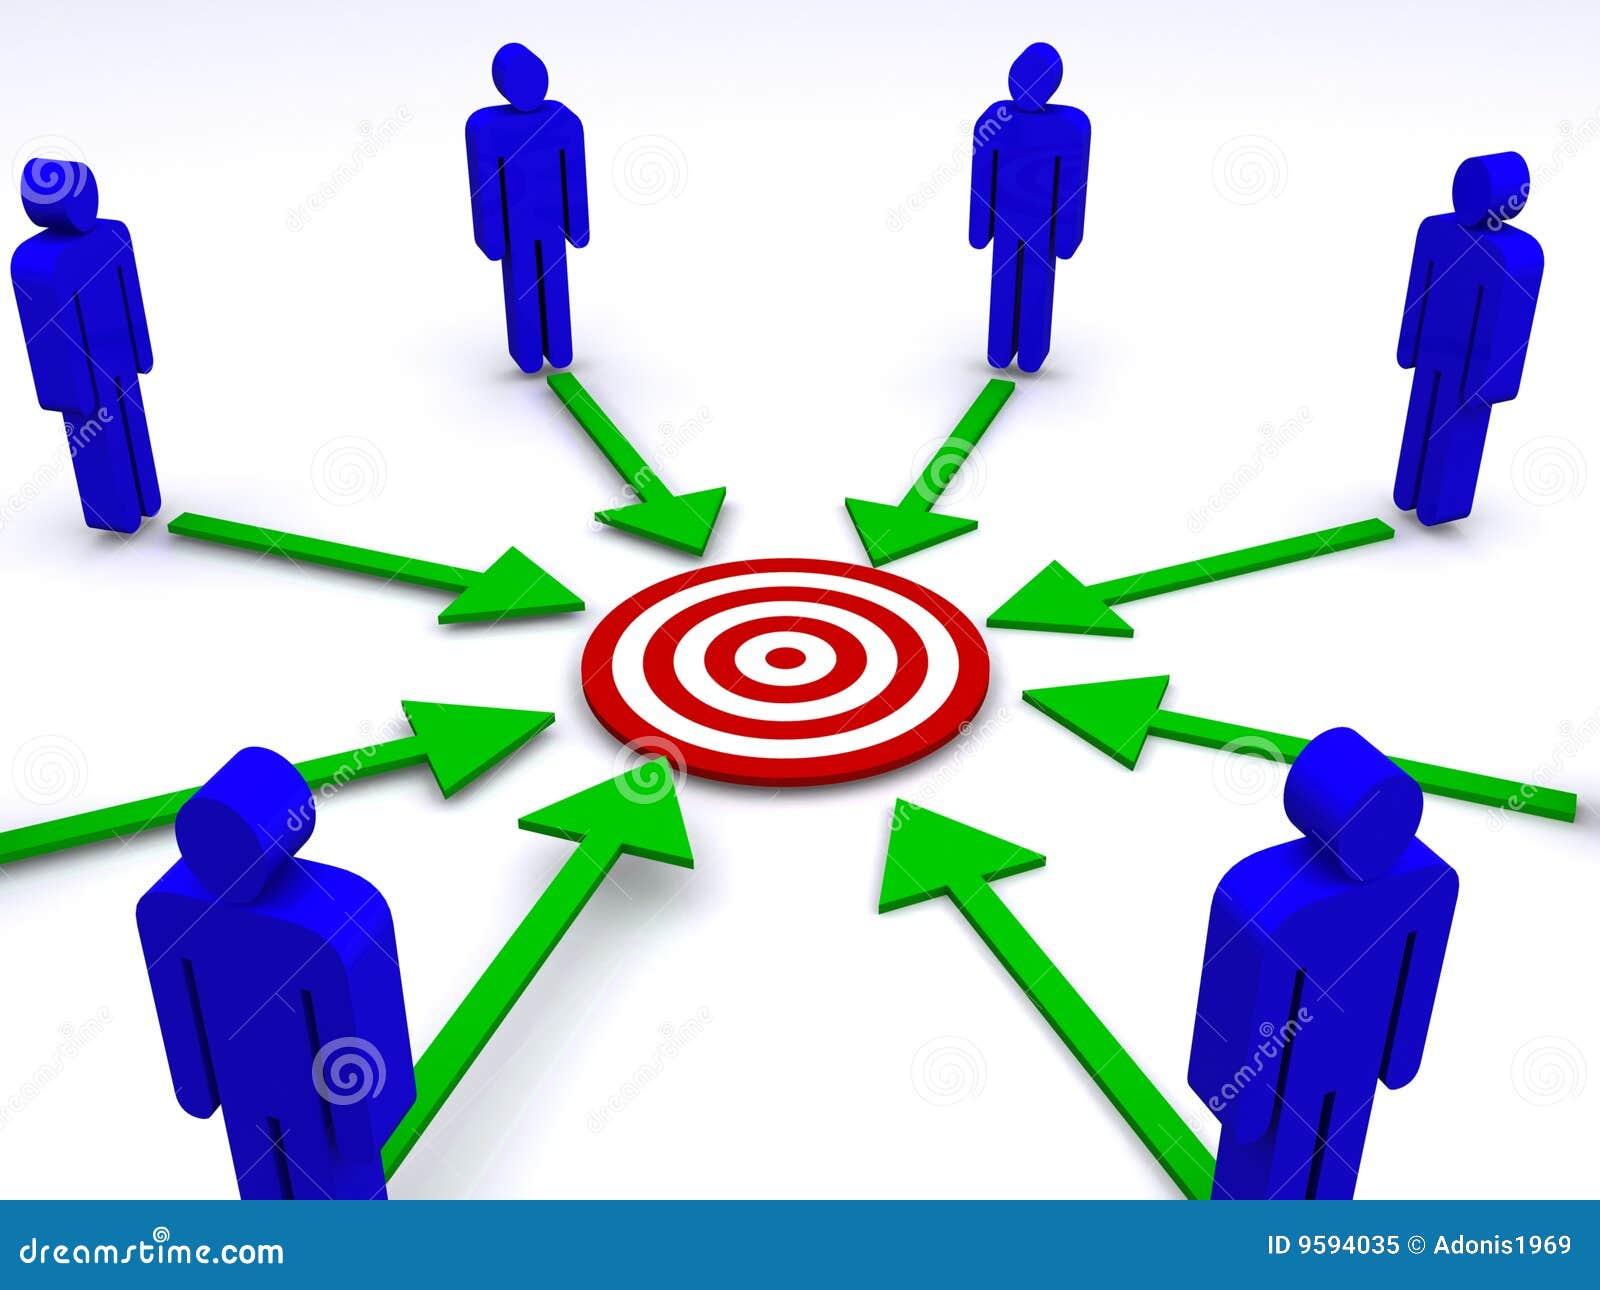 Business Team Communication Royalty Free Stock Photo - Image: 9594035